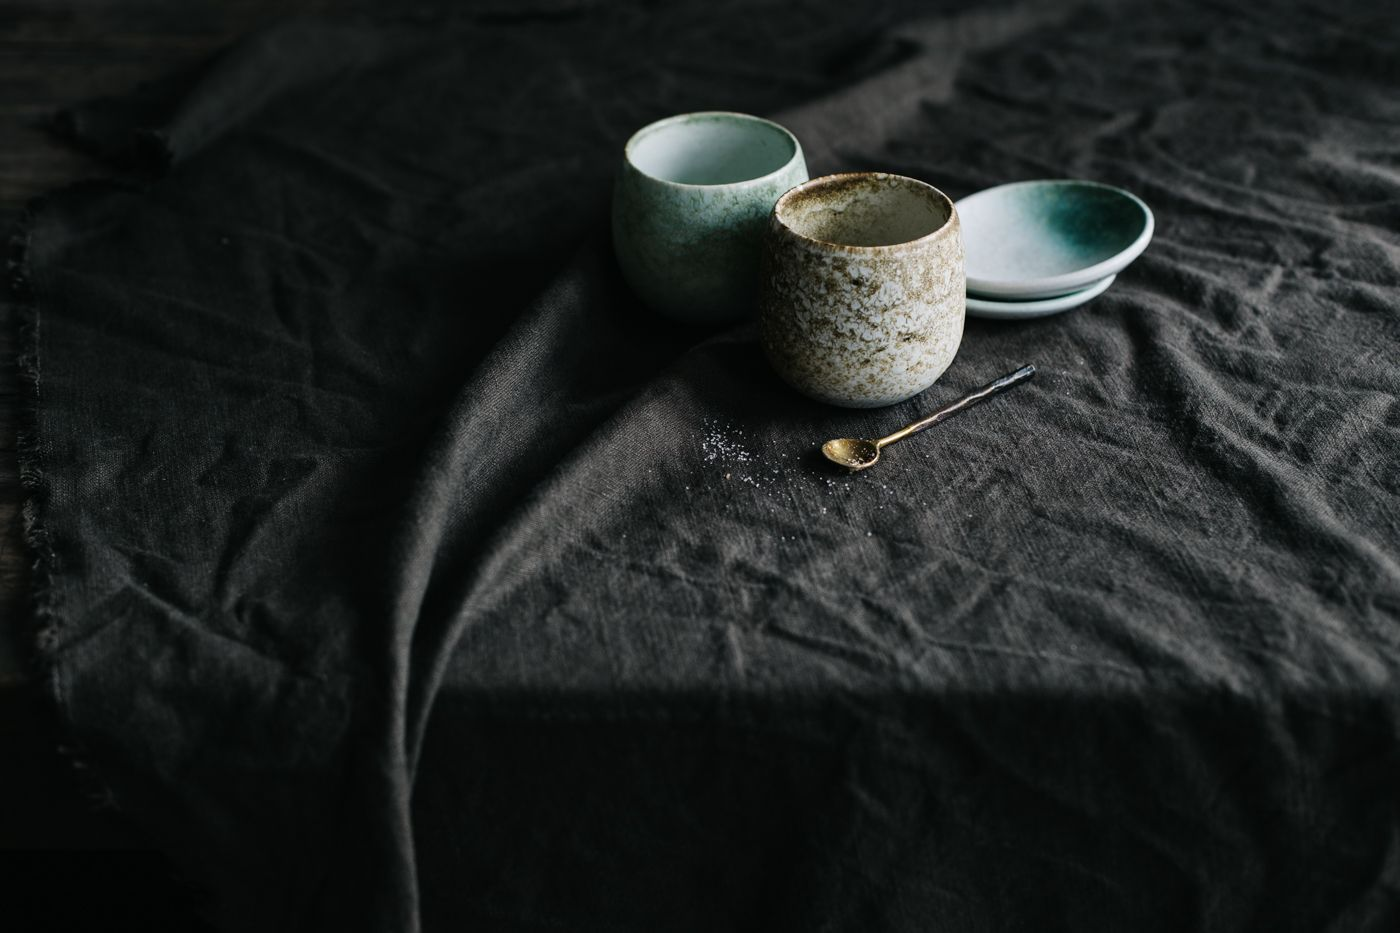 KH Würtz Ceramics by Aiala Hernando